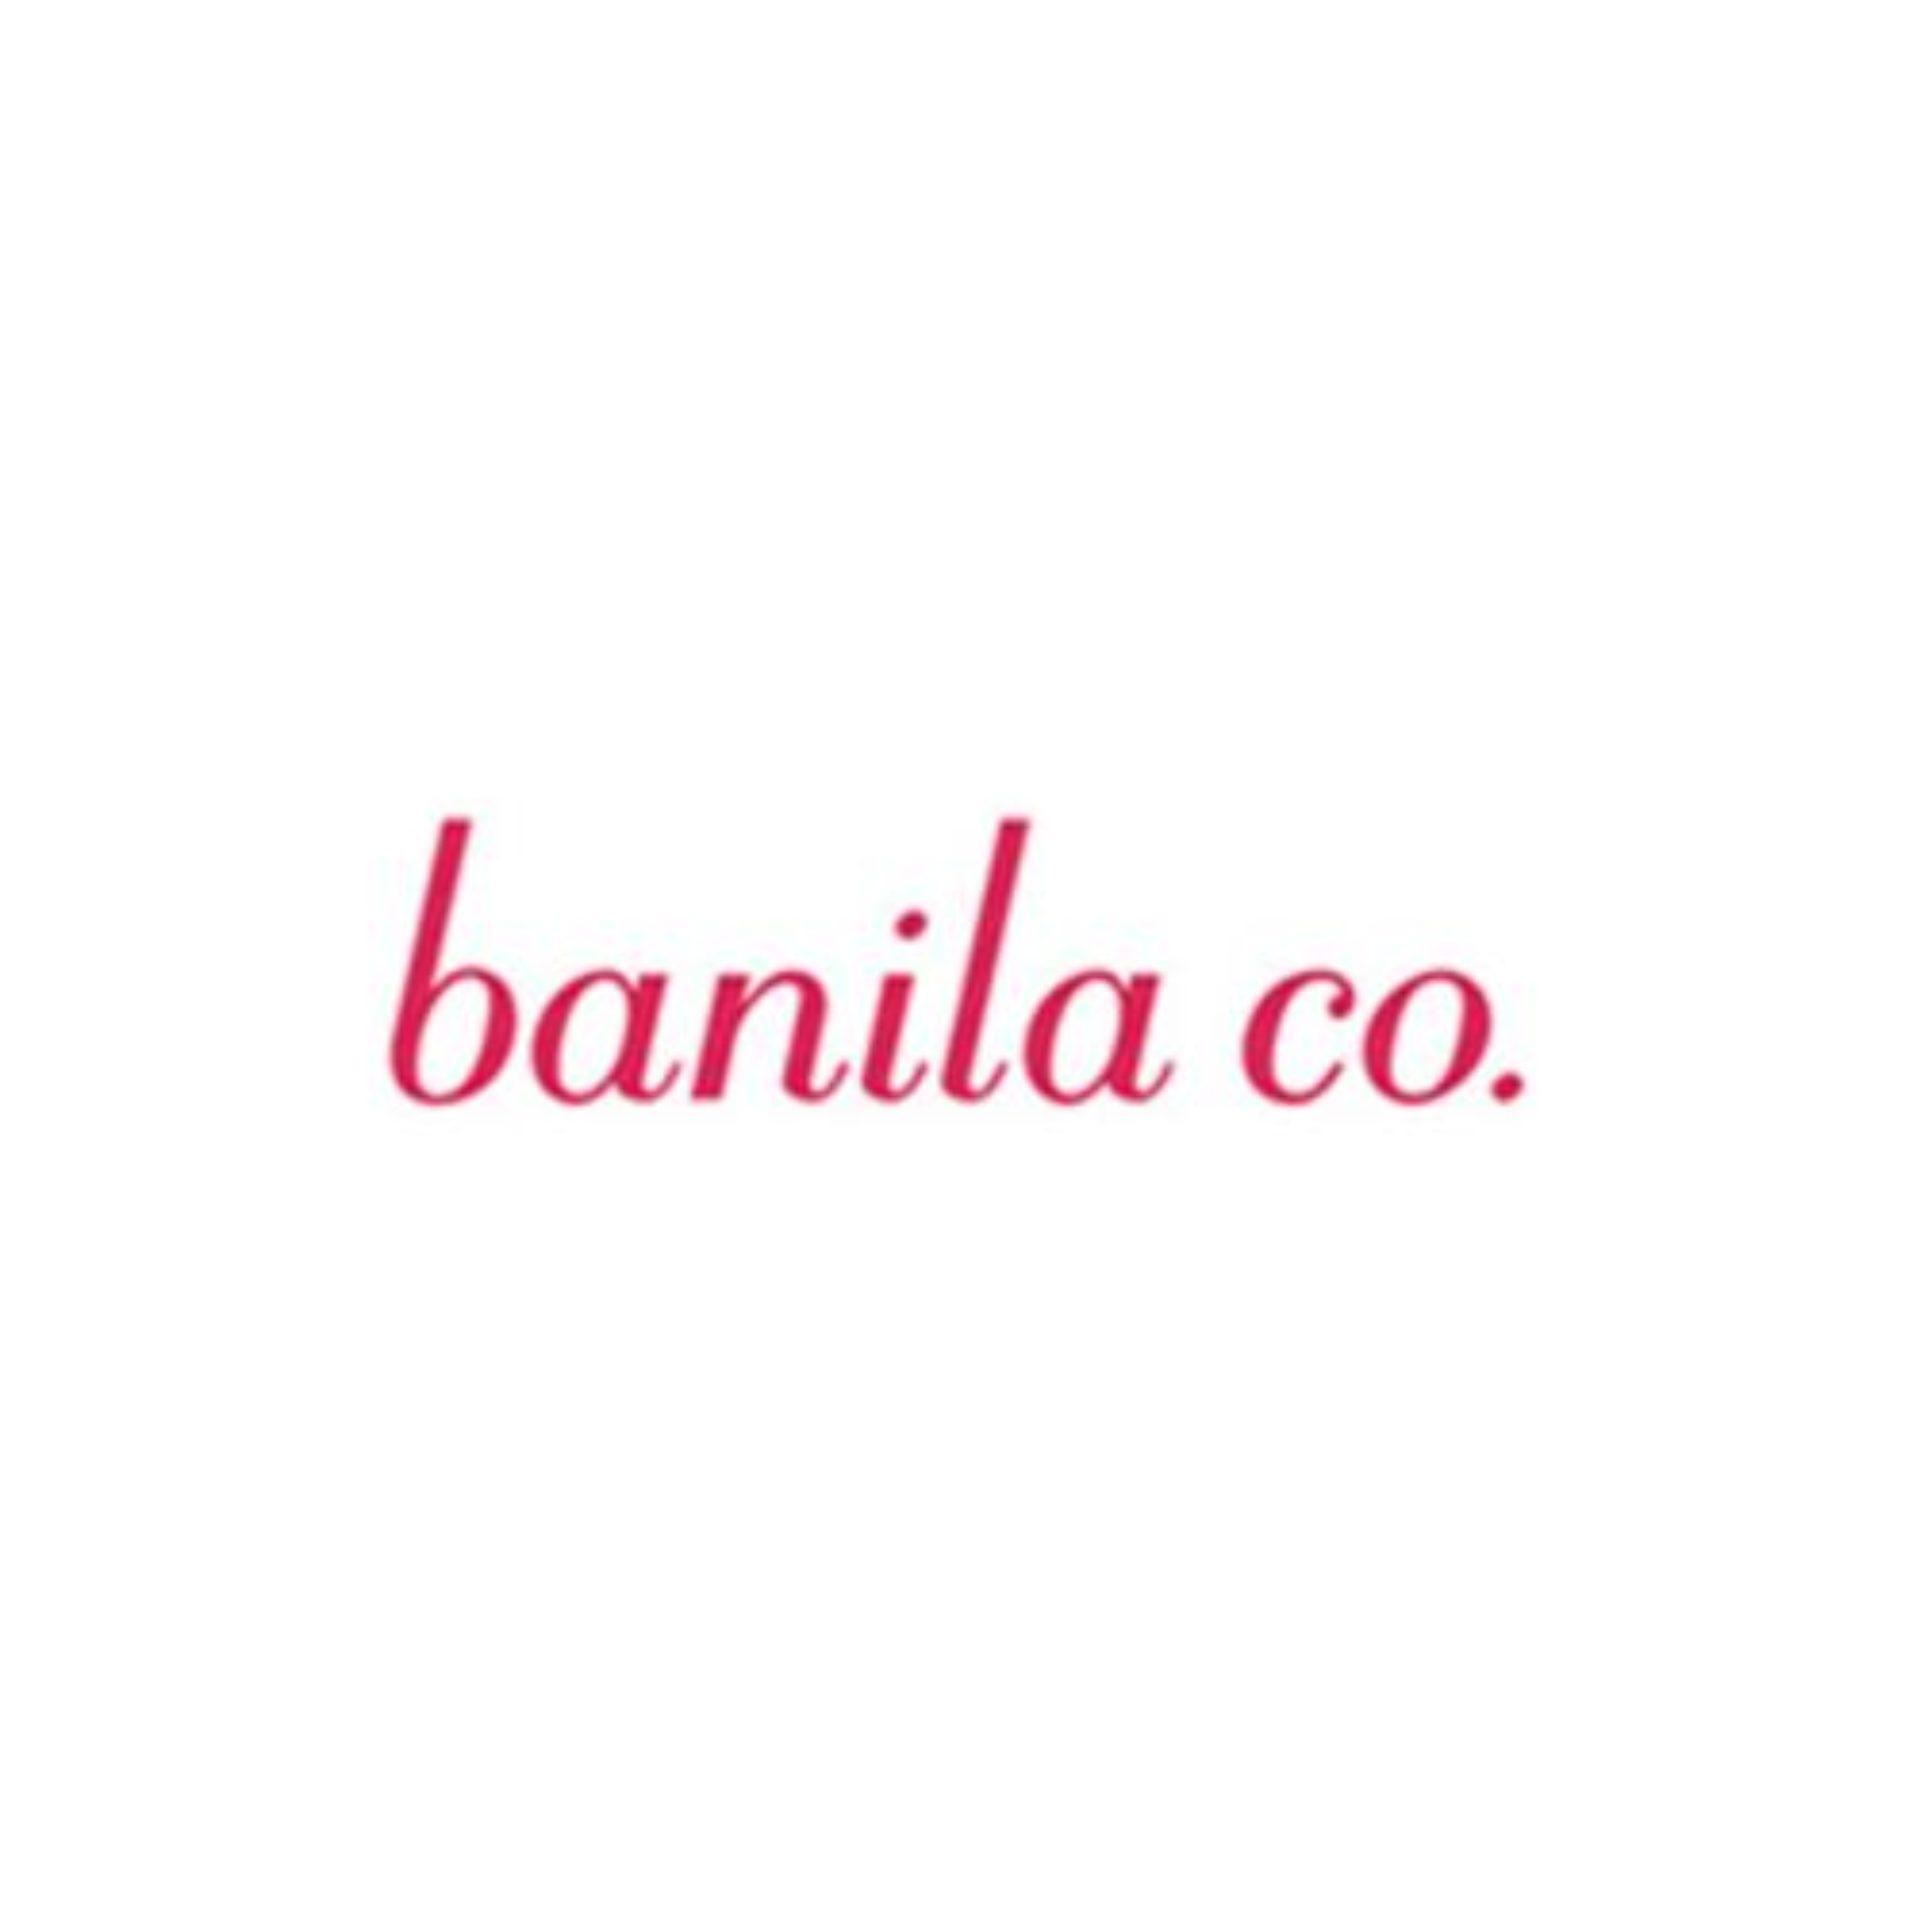 banila_co